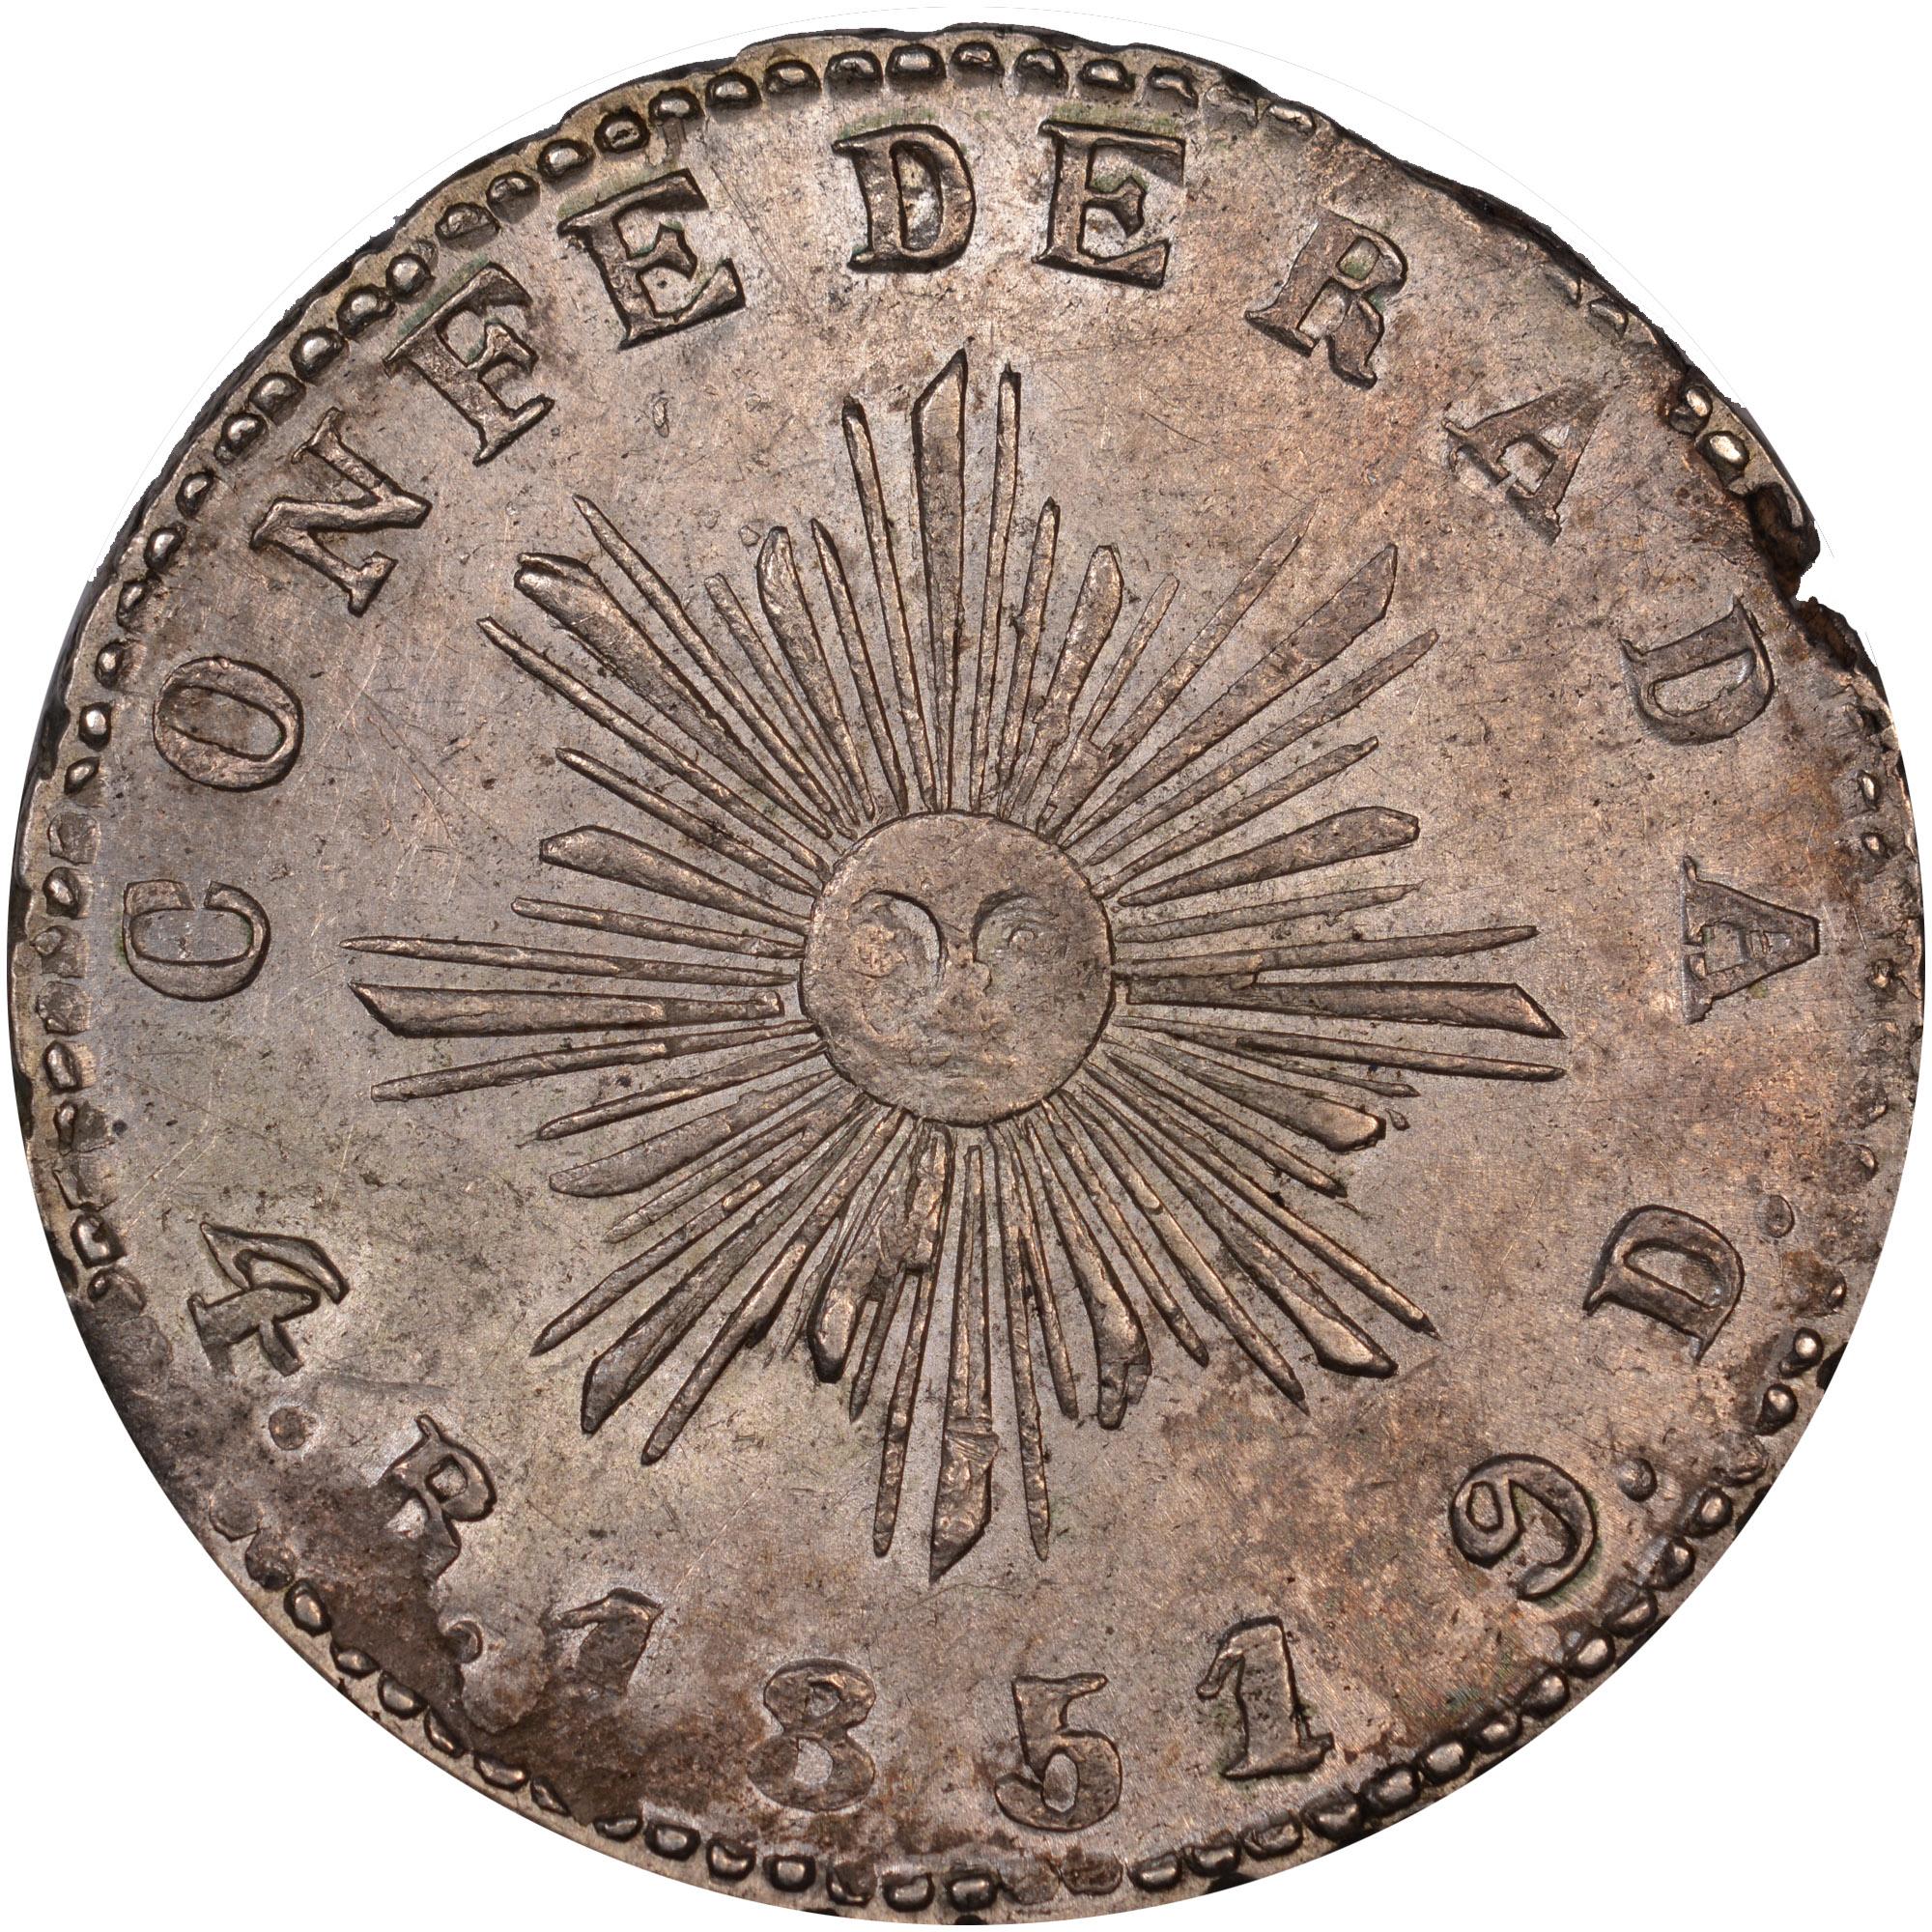 1846-1851 Argentina CORDOBA 4 Reales reverse